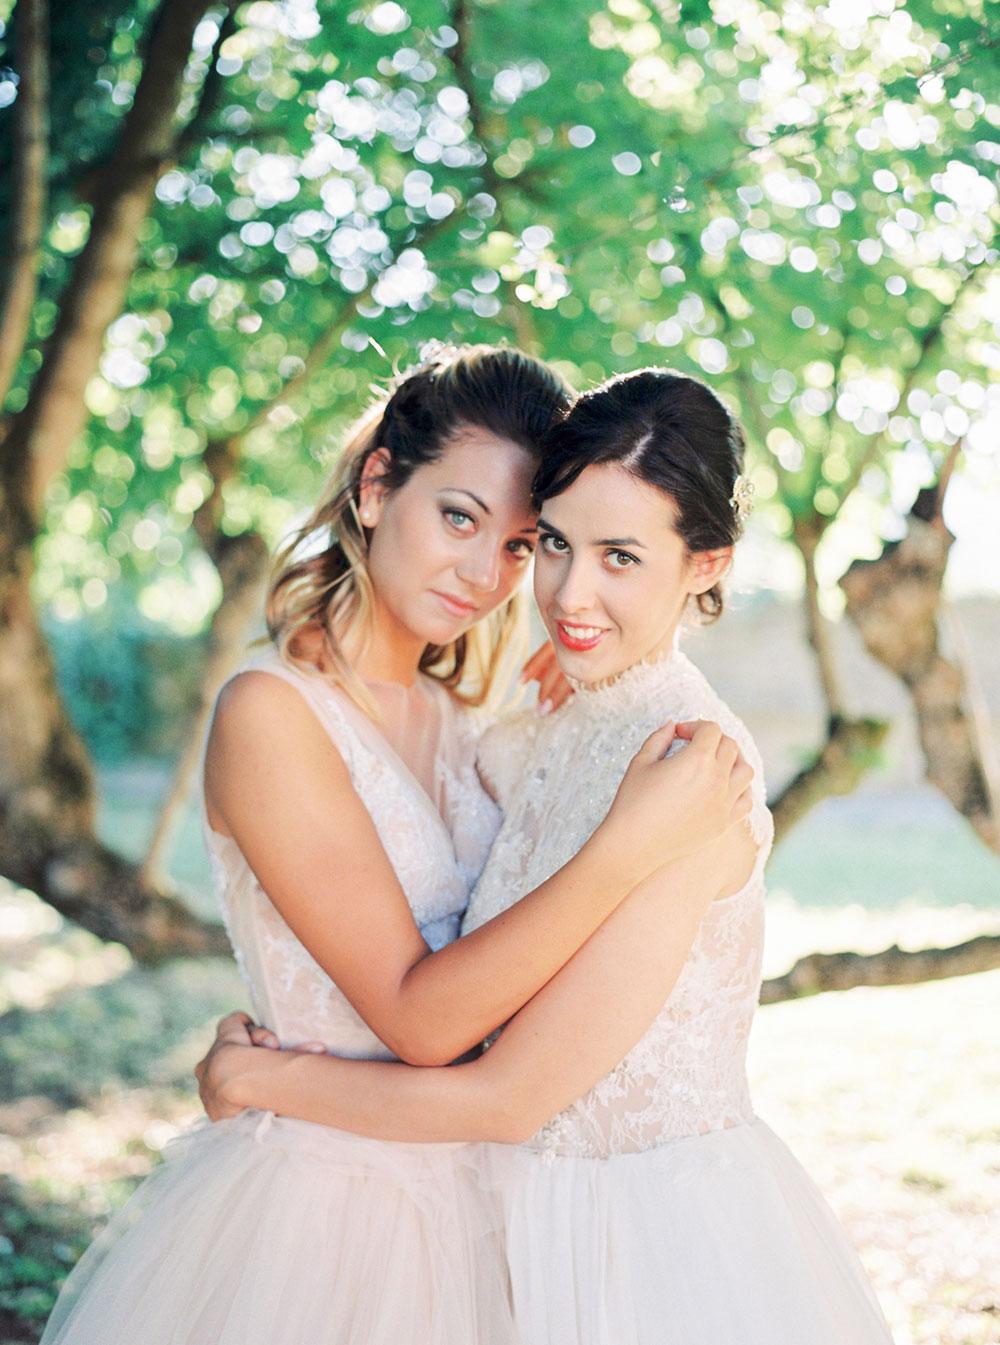 Linari-Tuscany-Elopement-Courtney-Michaela-286